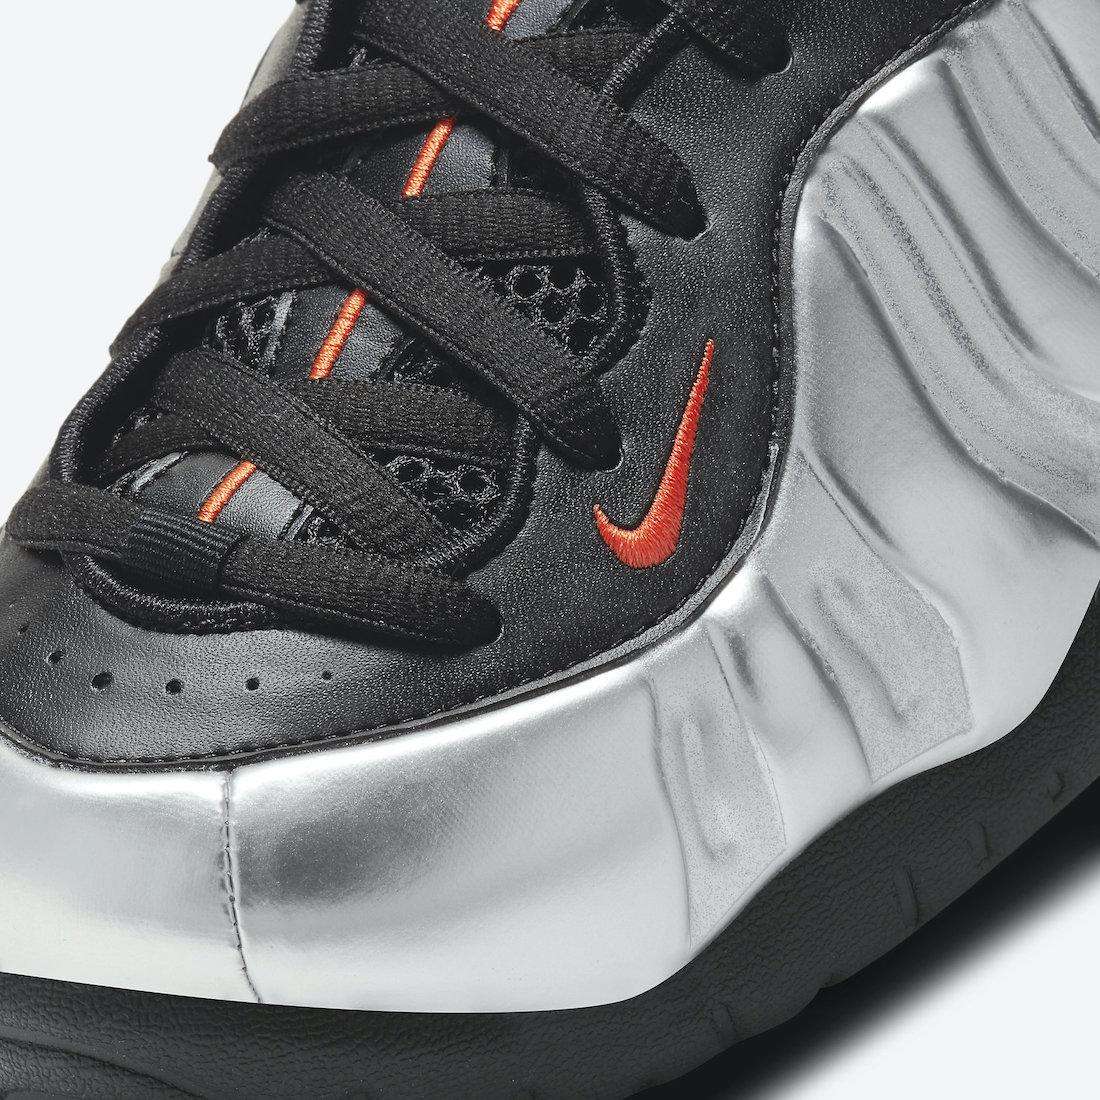 Nike-Air-Foamposite-Pro-Halloween-CT2286-001-Release-Date-Price-6